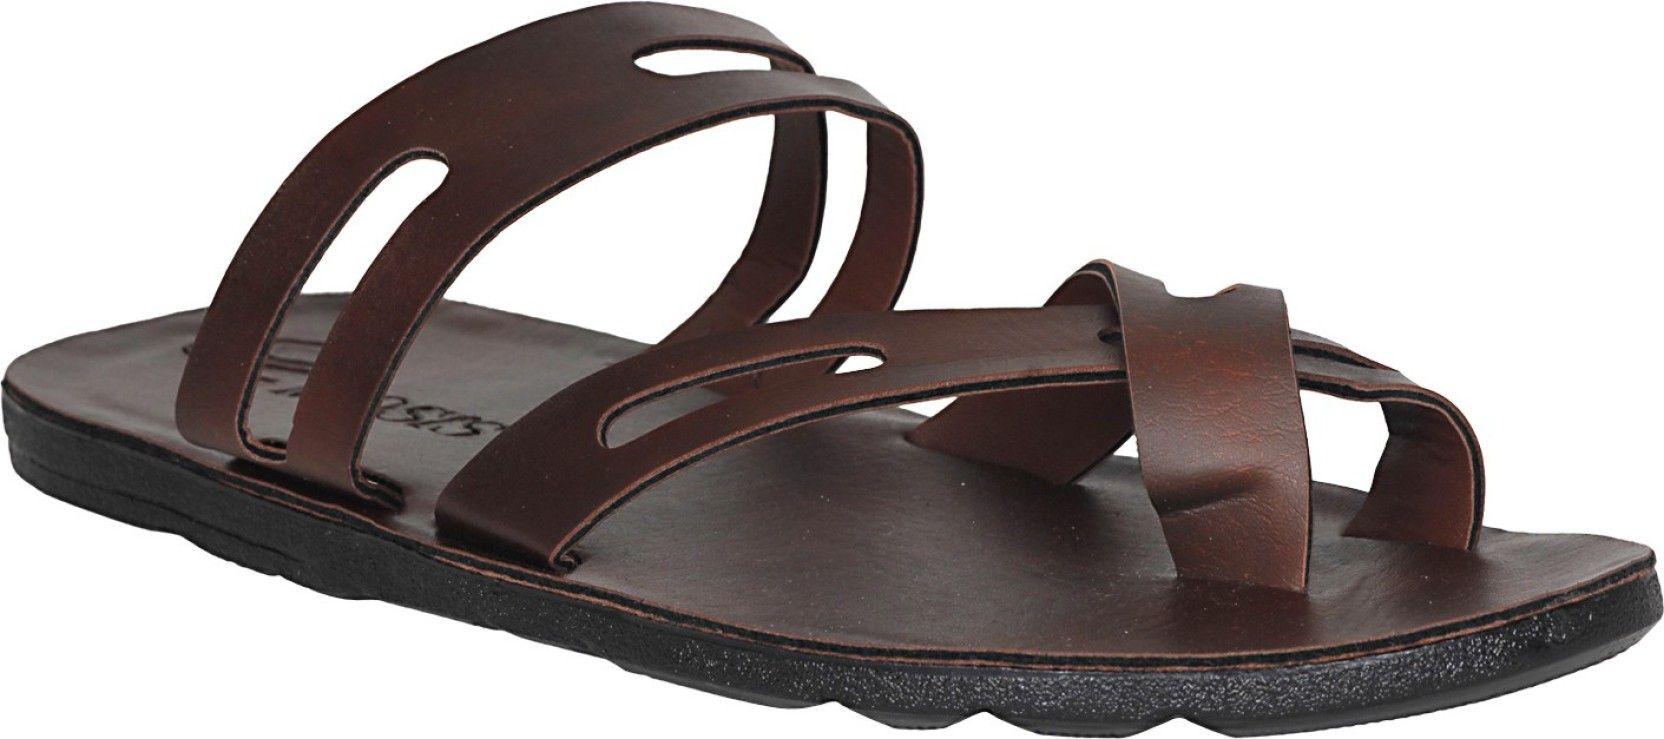 Emosis Men Brown Sandals - Buy Emosis Men Brown Sandals Online at Best Price - Shop Online for Footwears in India | Flipkart.com